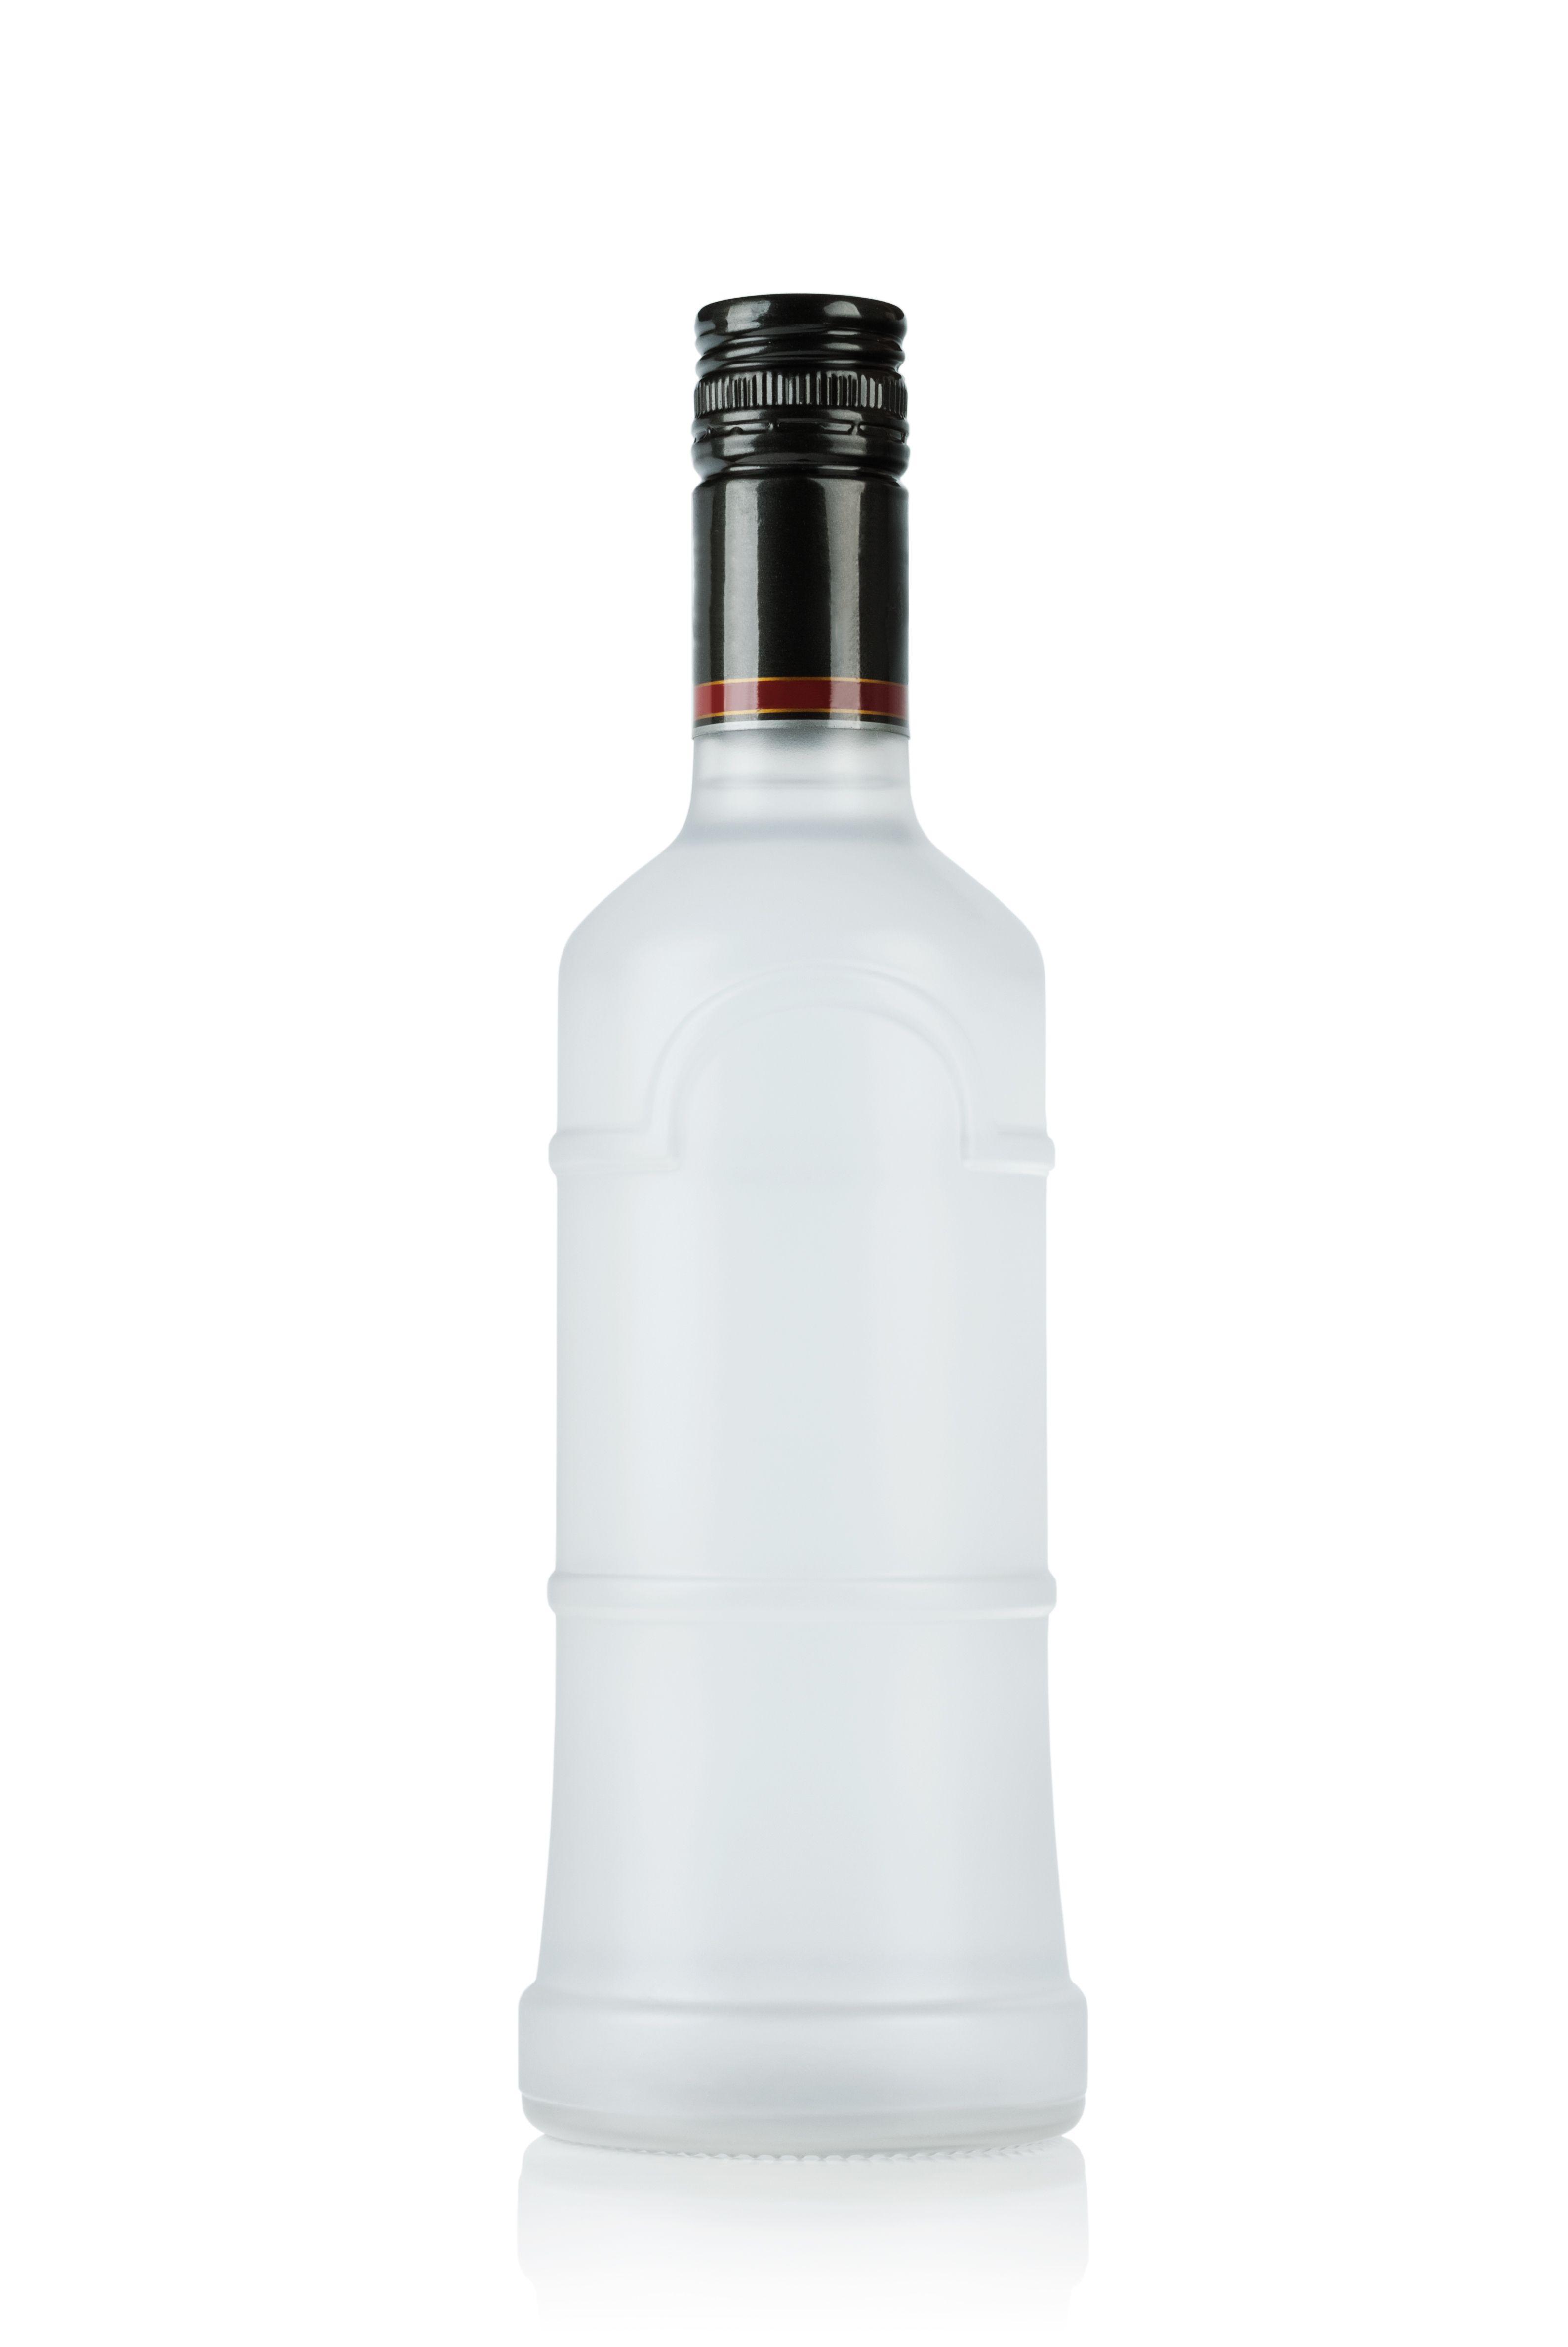 homemade weed killers vodka